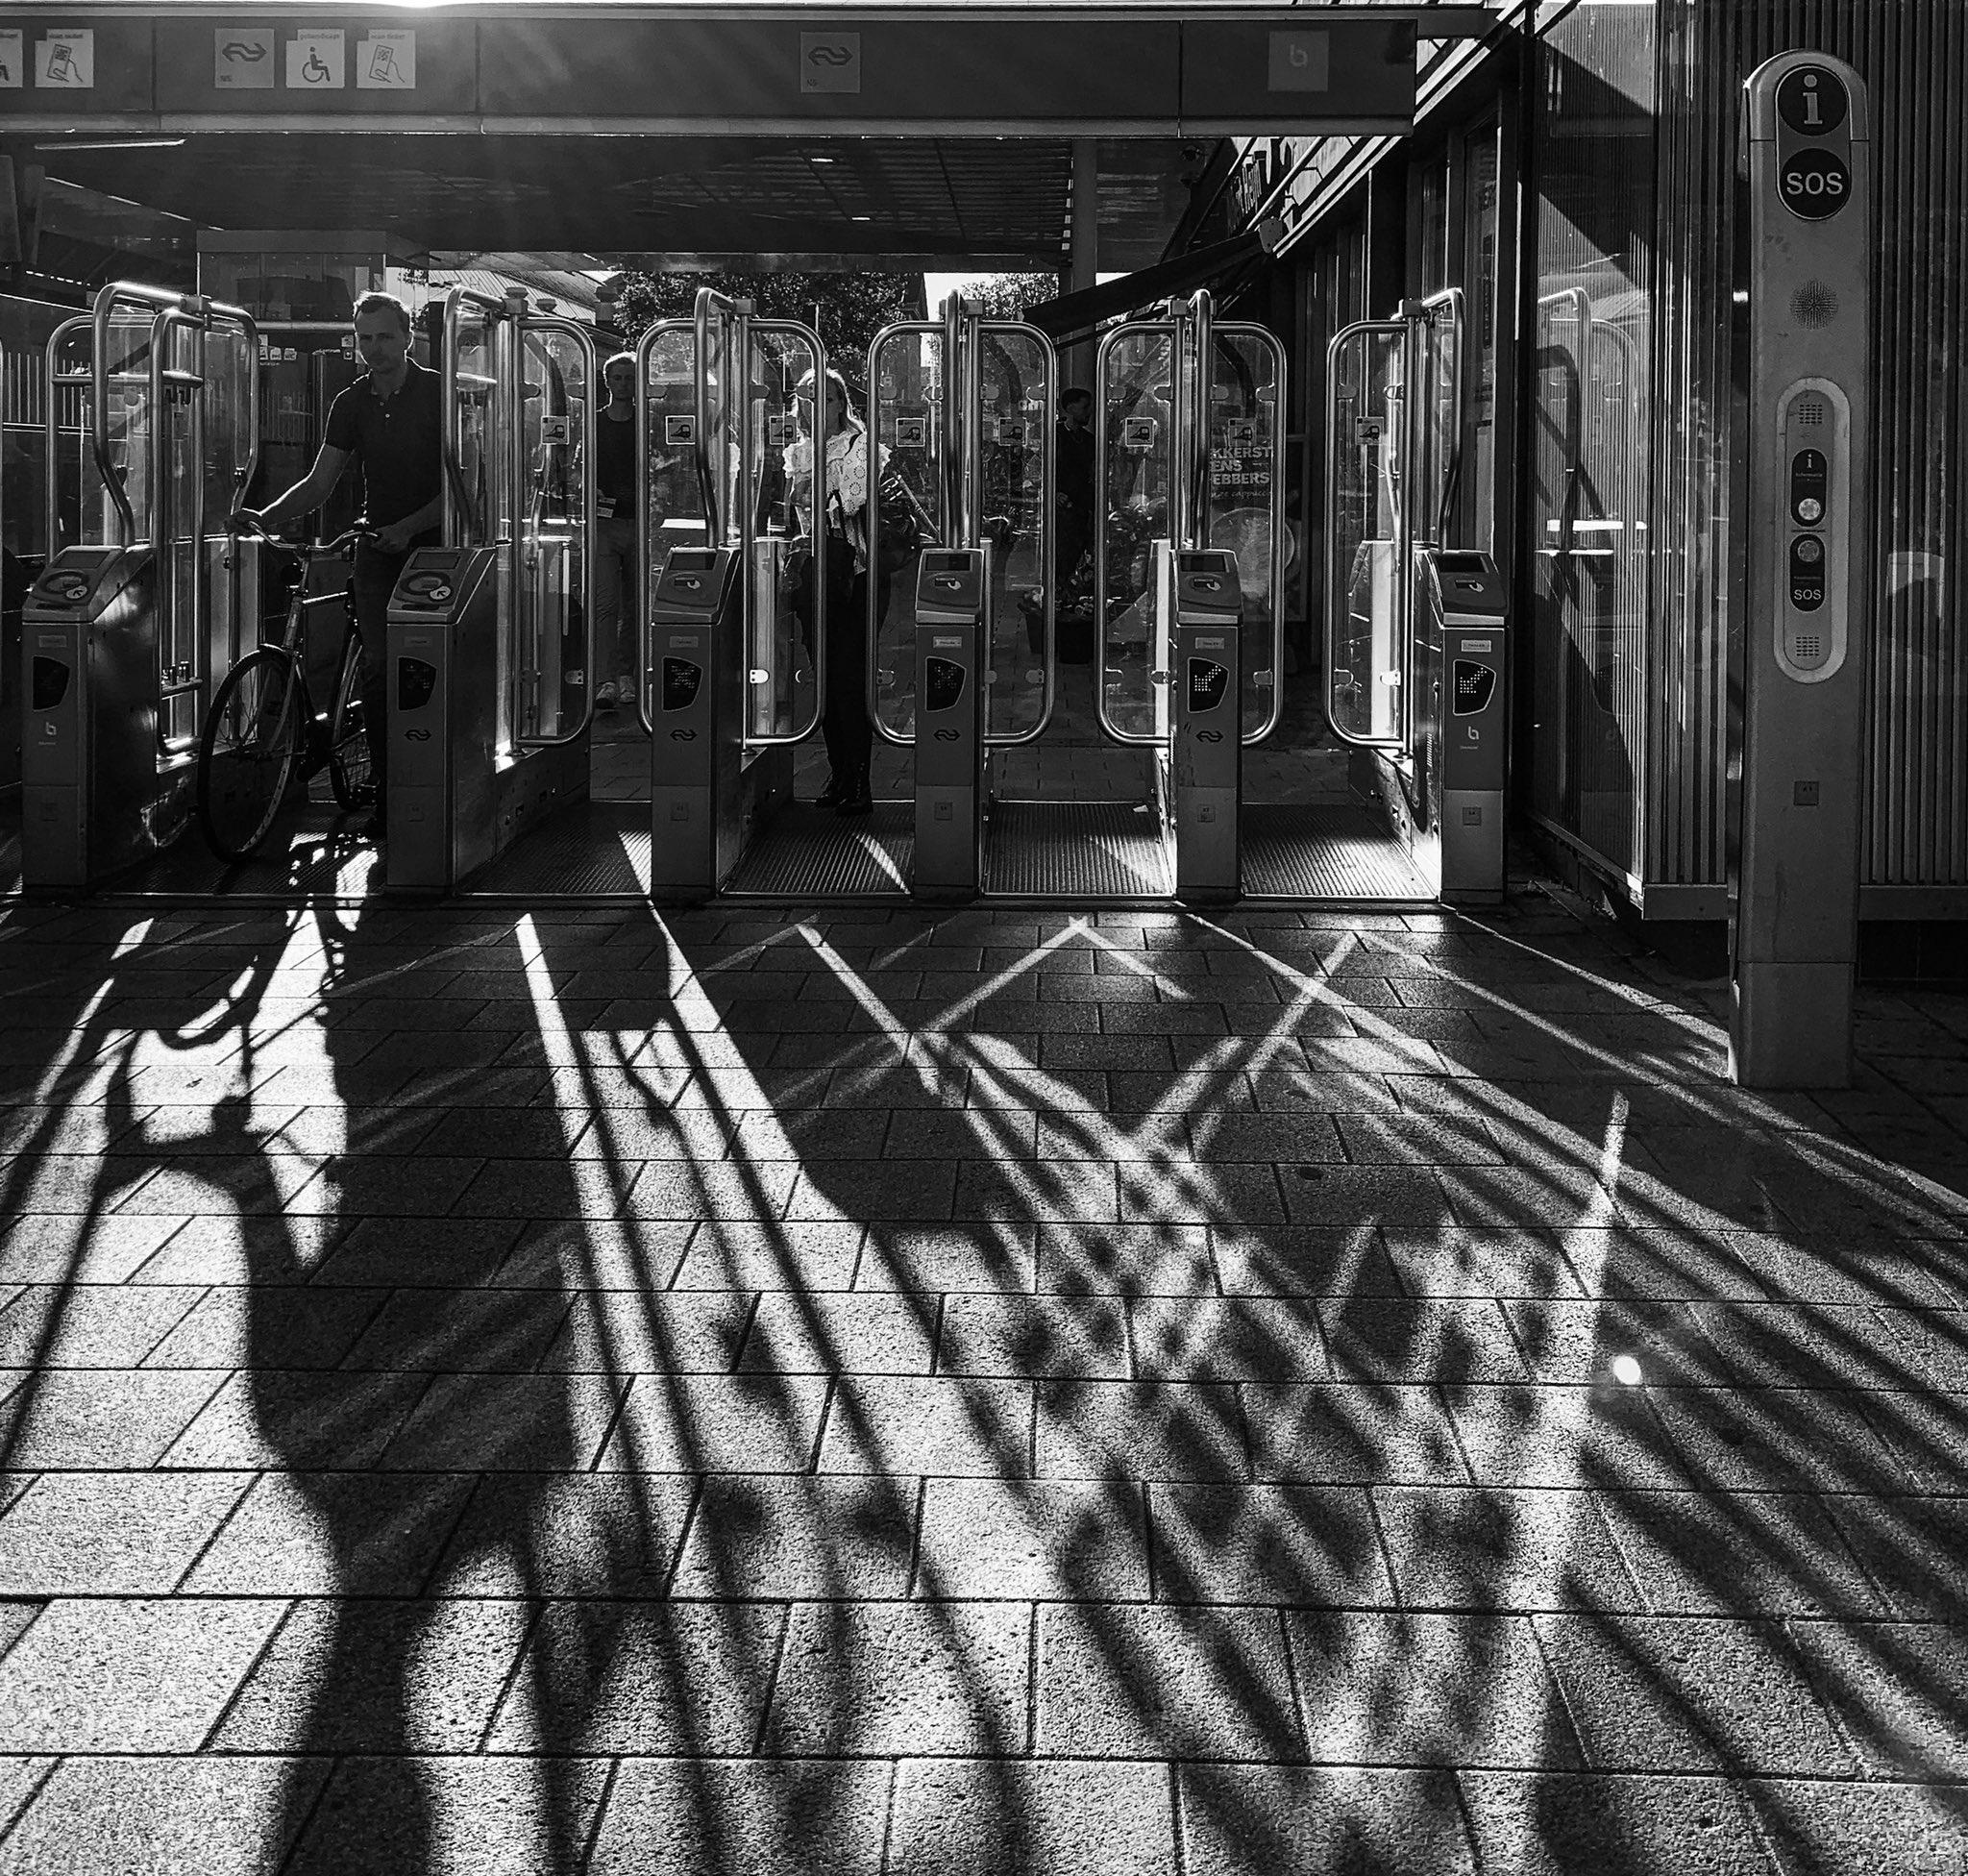 black_and_white_street_photography_15.jpg